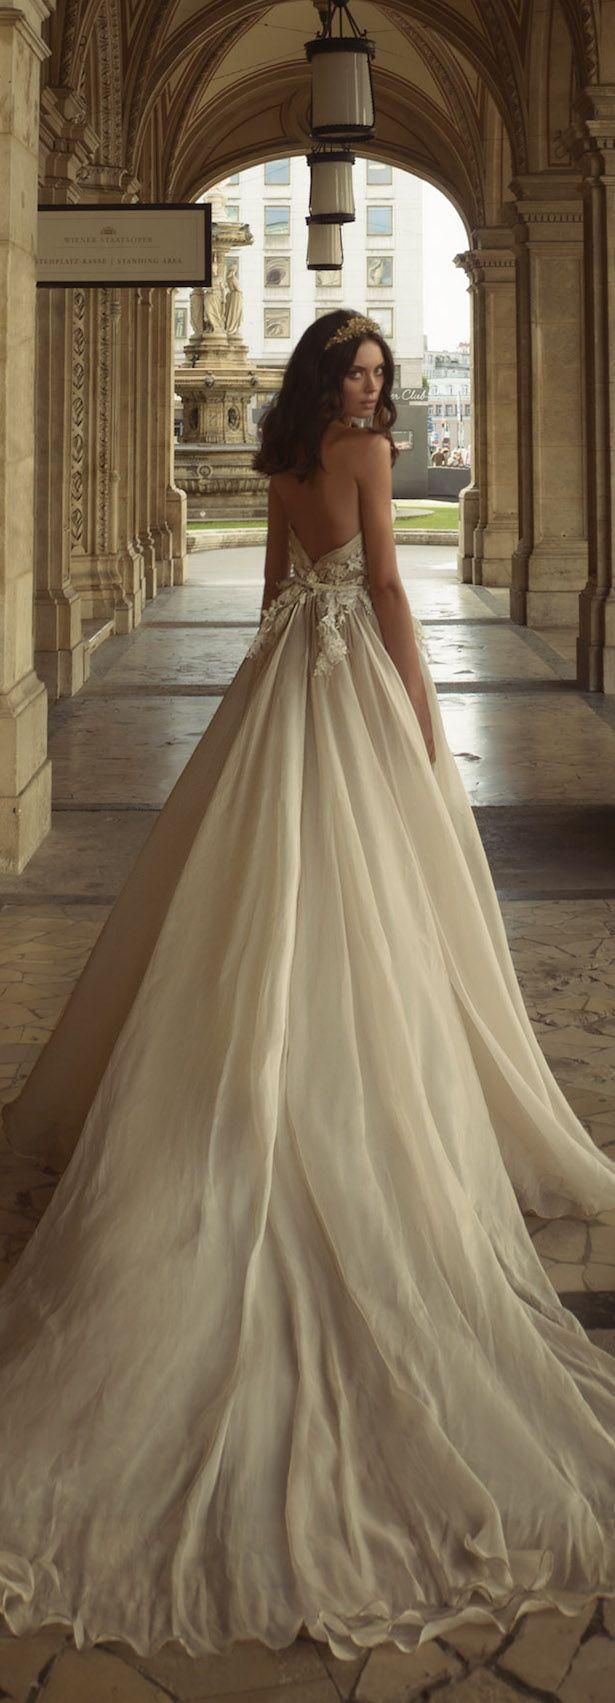 Boda - Fairytale Wedding Haute Couture